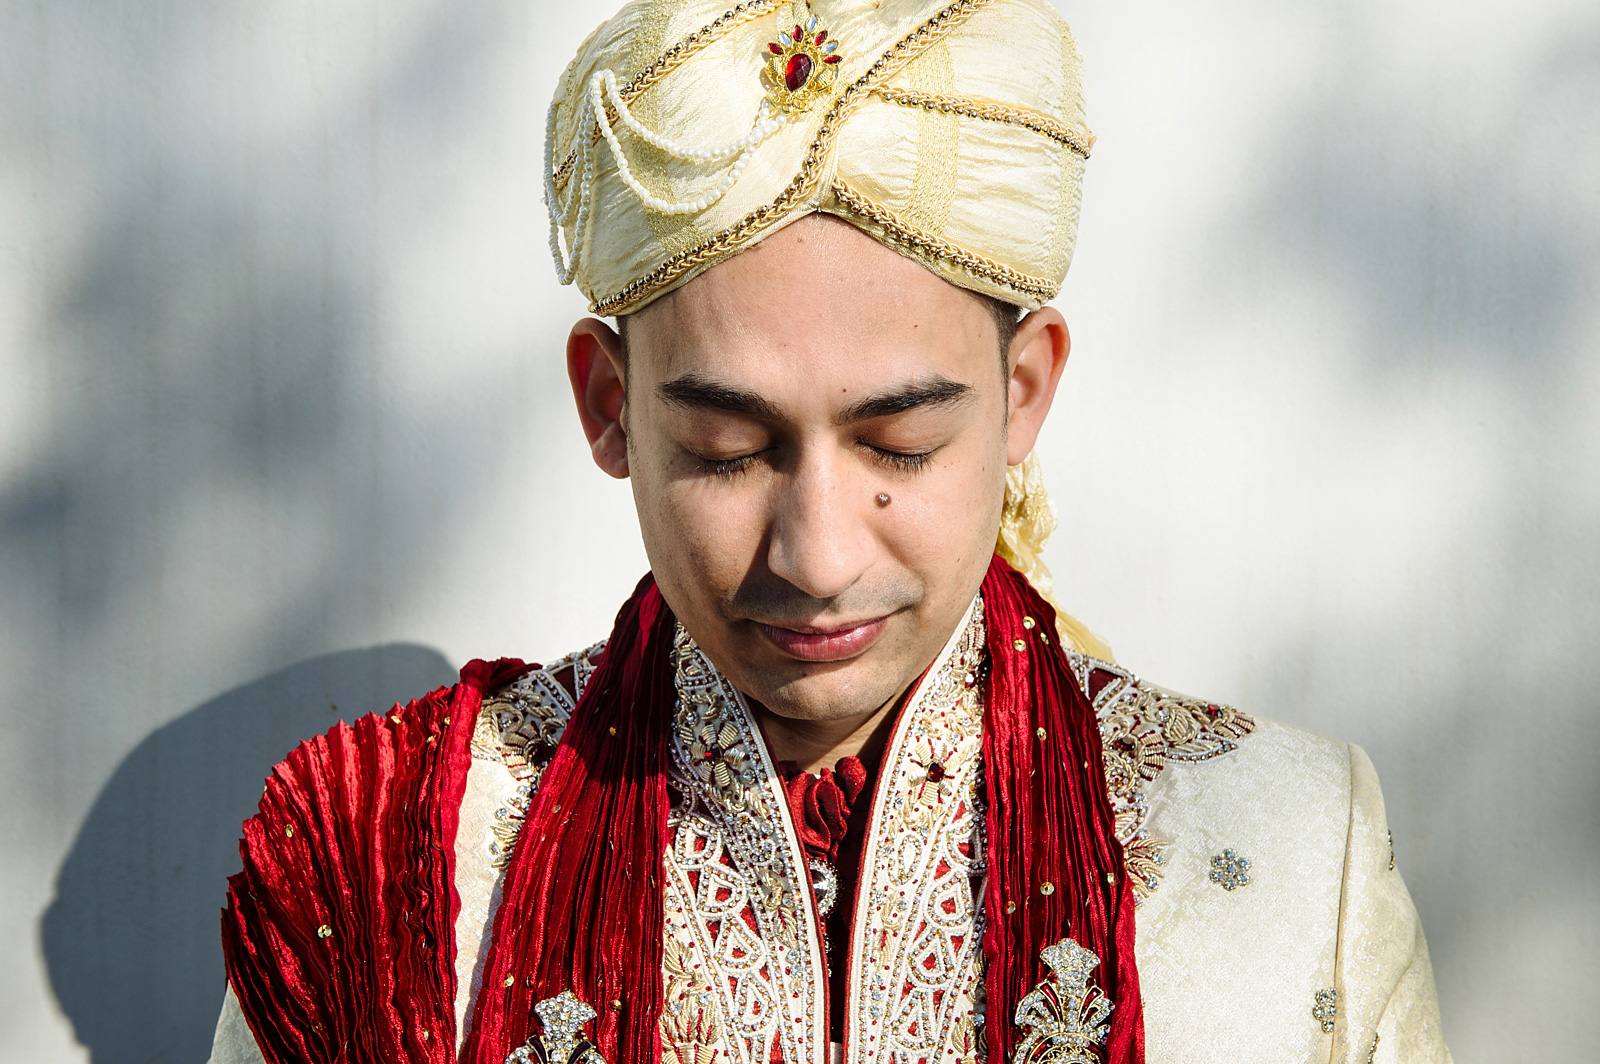 Indian groom with turban